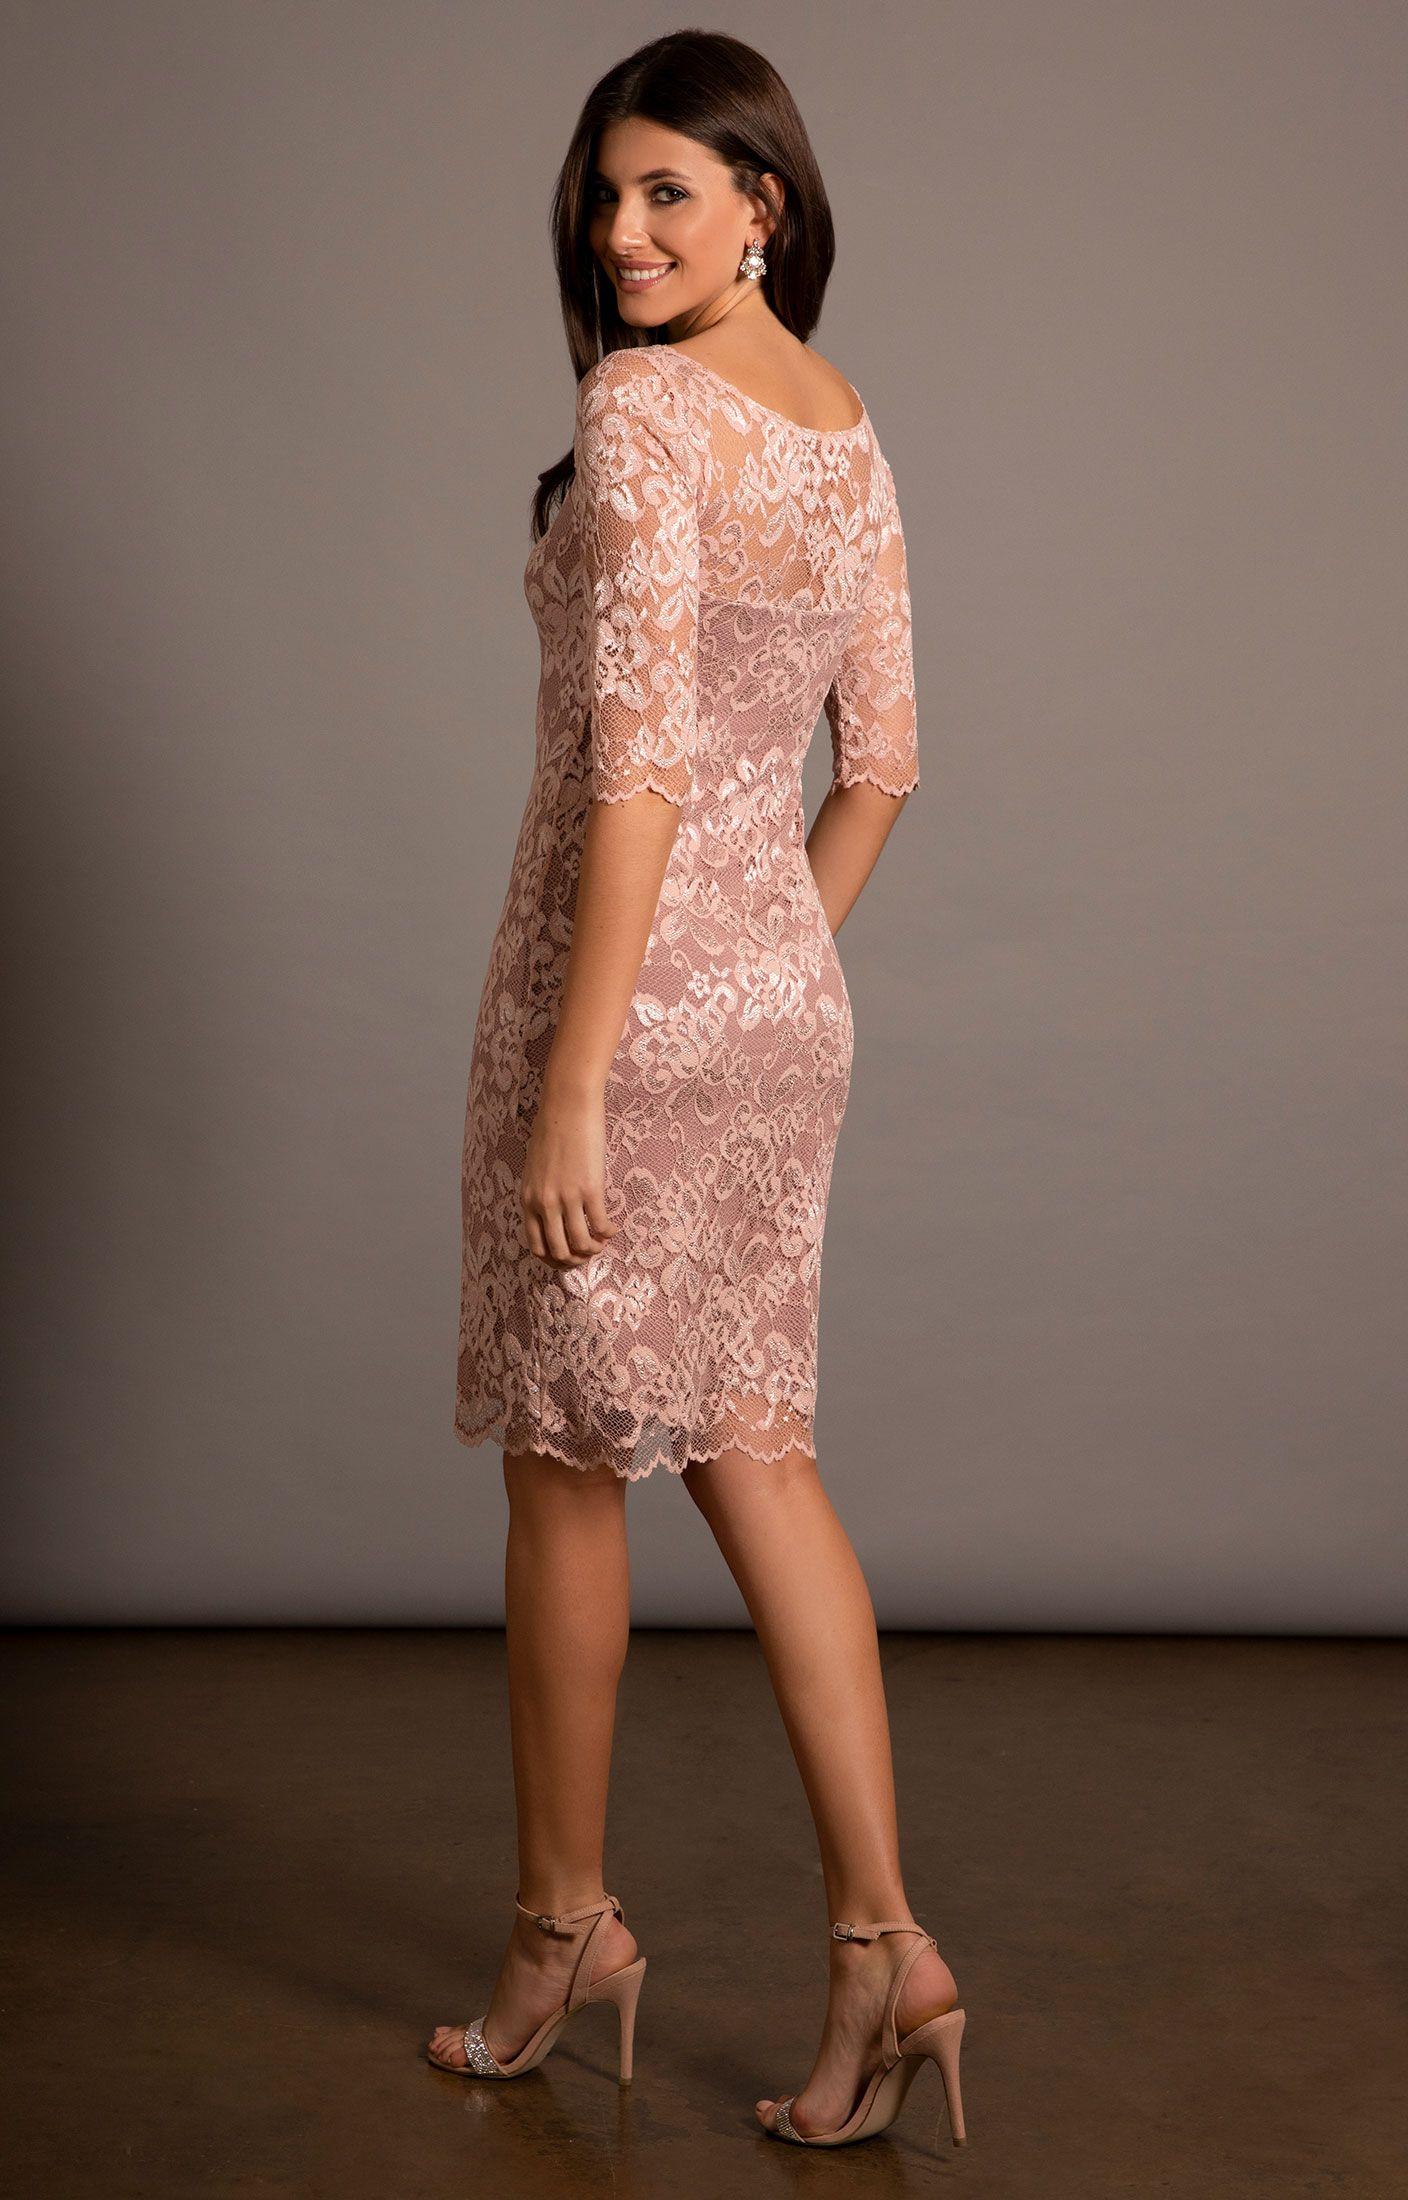 Lila Occasion Dress Short Vintage Rose By Alie Street Short Dresses Dresses Occasion Dresses [ 2200 x 1408 Pixel ]